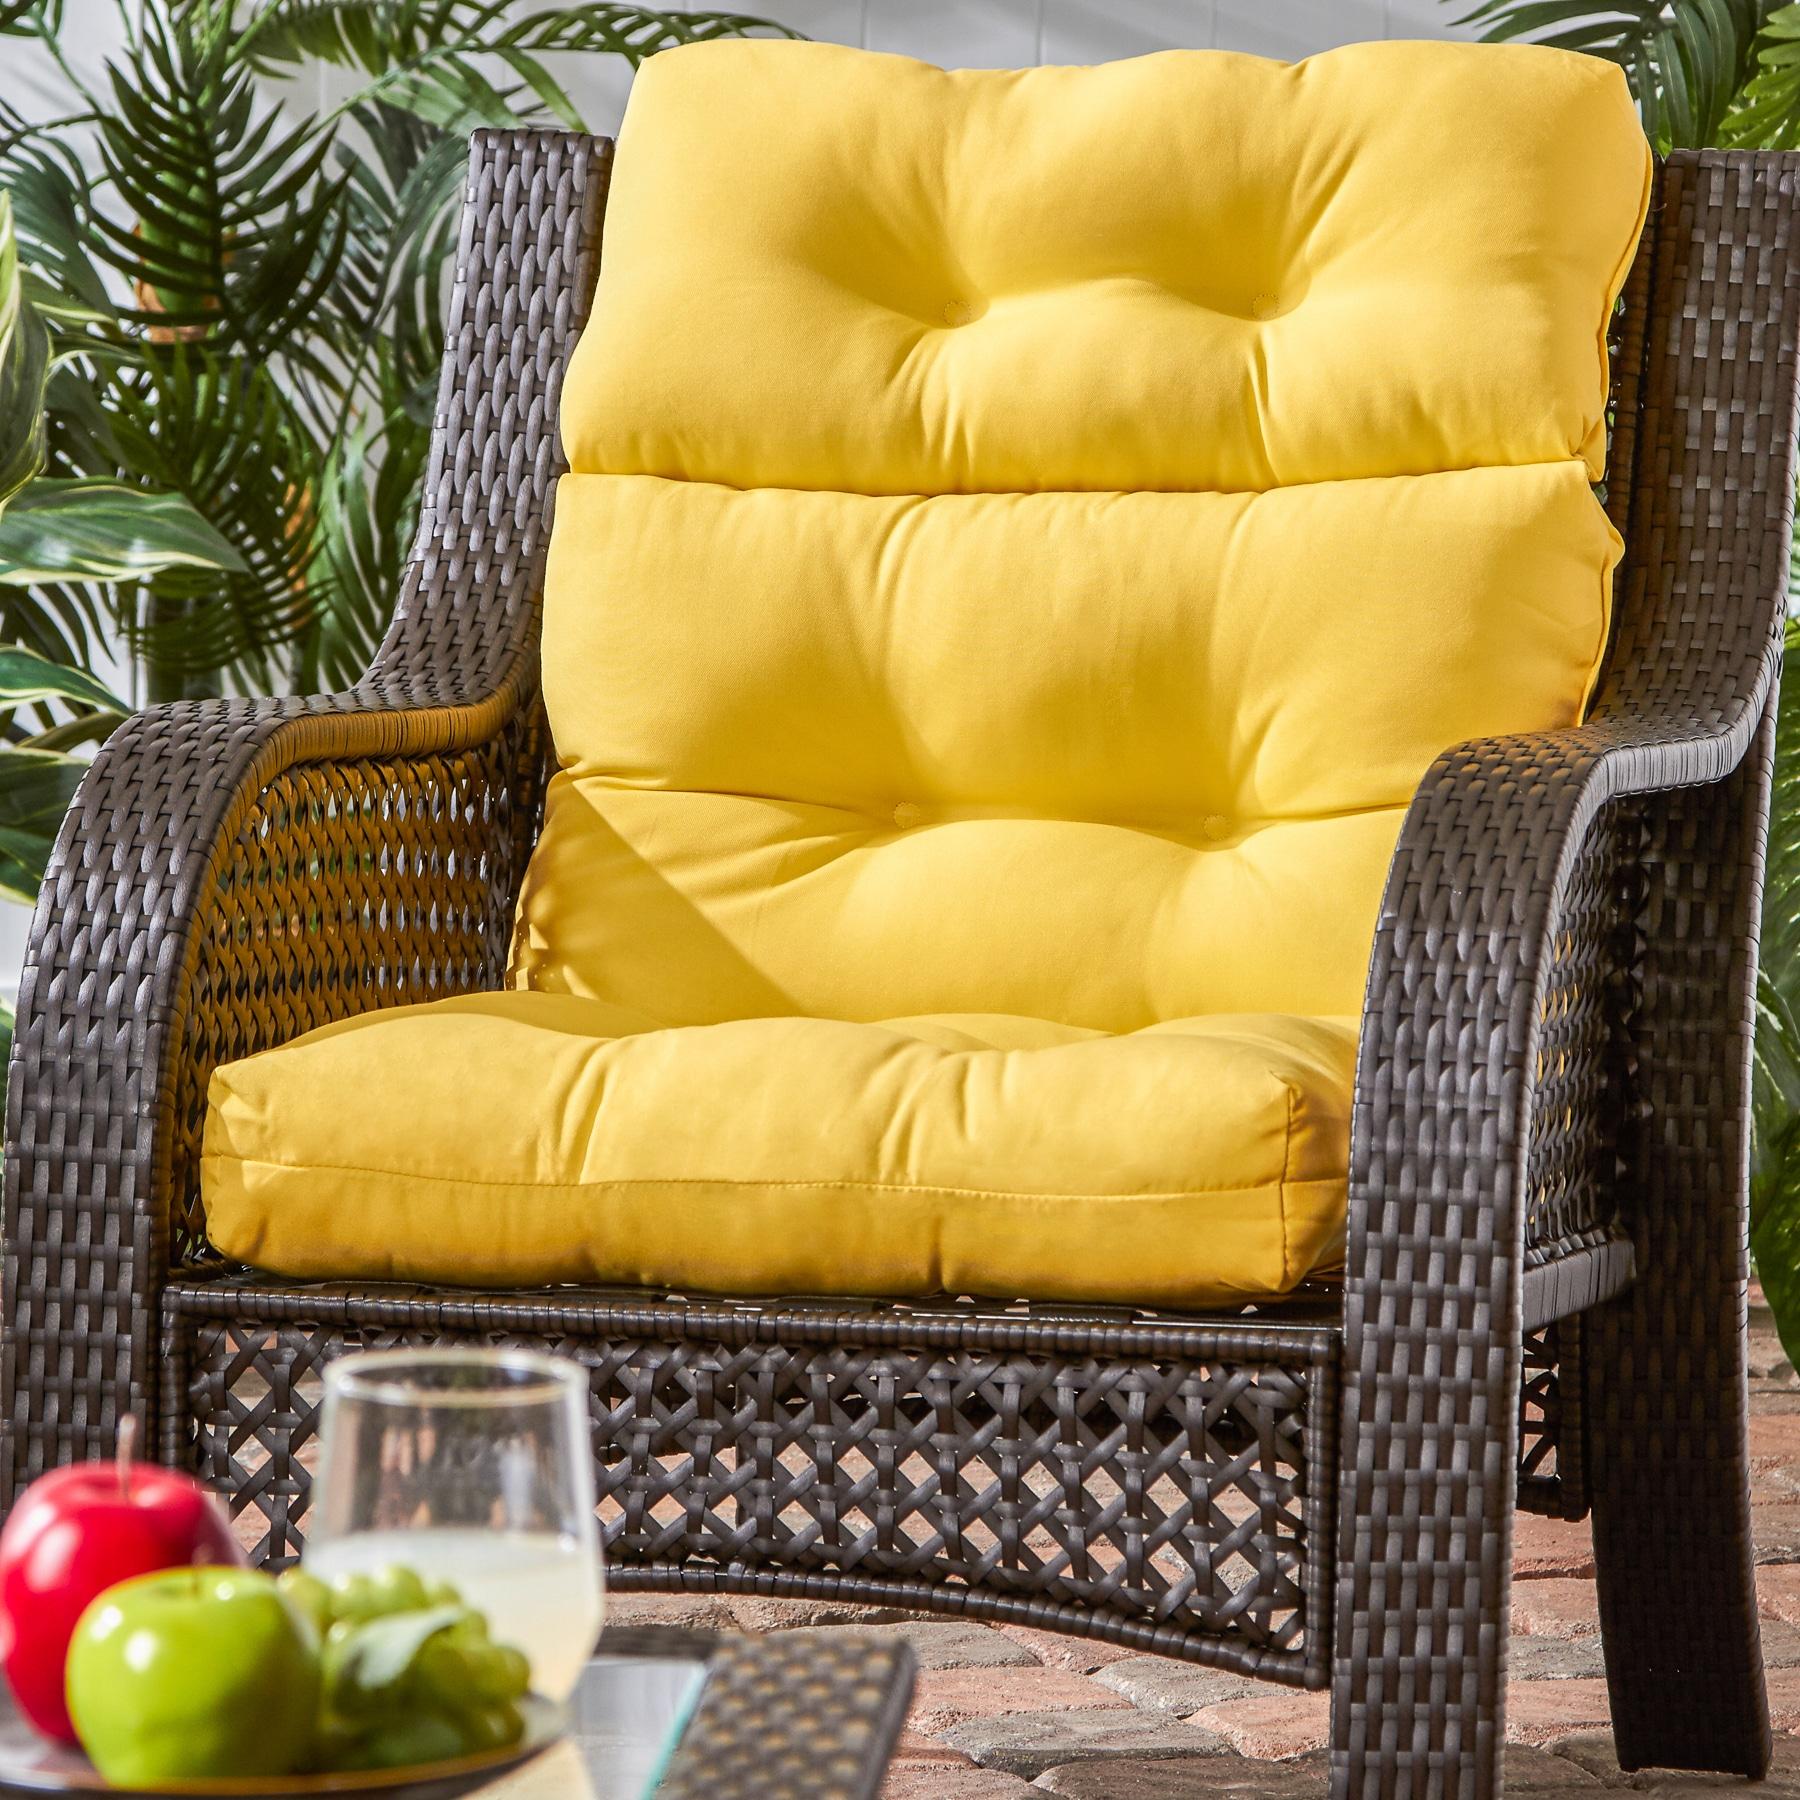 Great Greendale Home Fashions Sunbeam Outdoor High Back Chair Cushion   22w X 44l